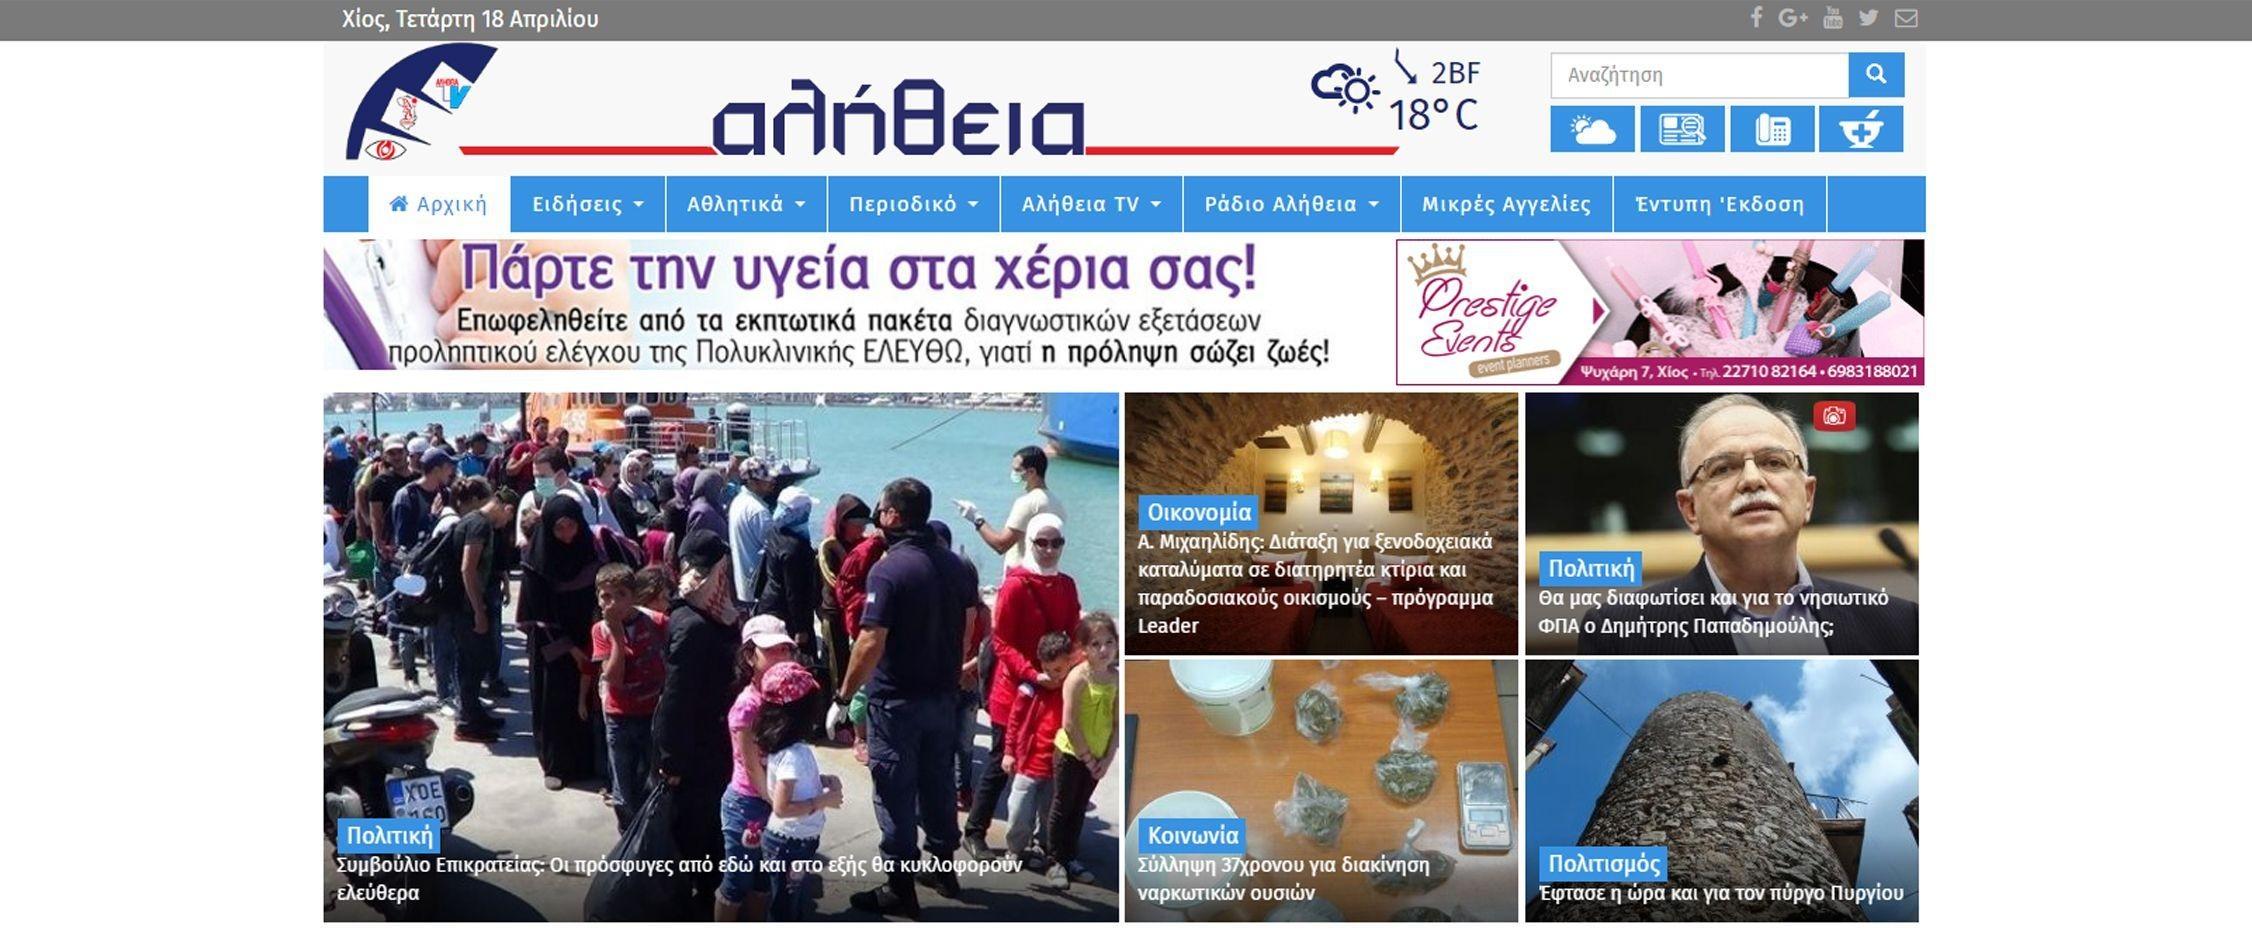 Alithia - TruthWebMedia project